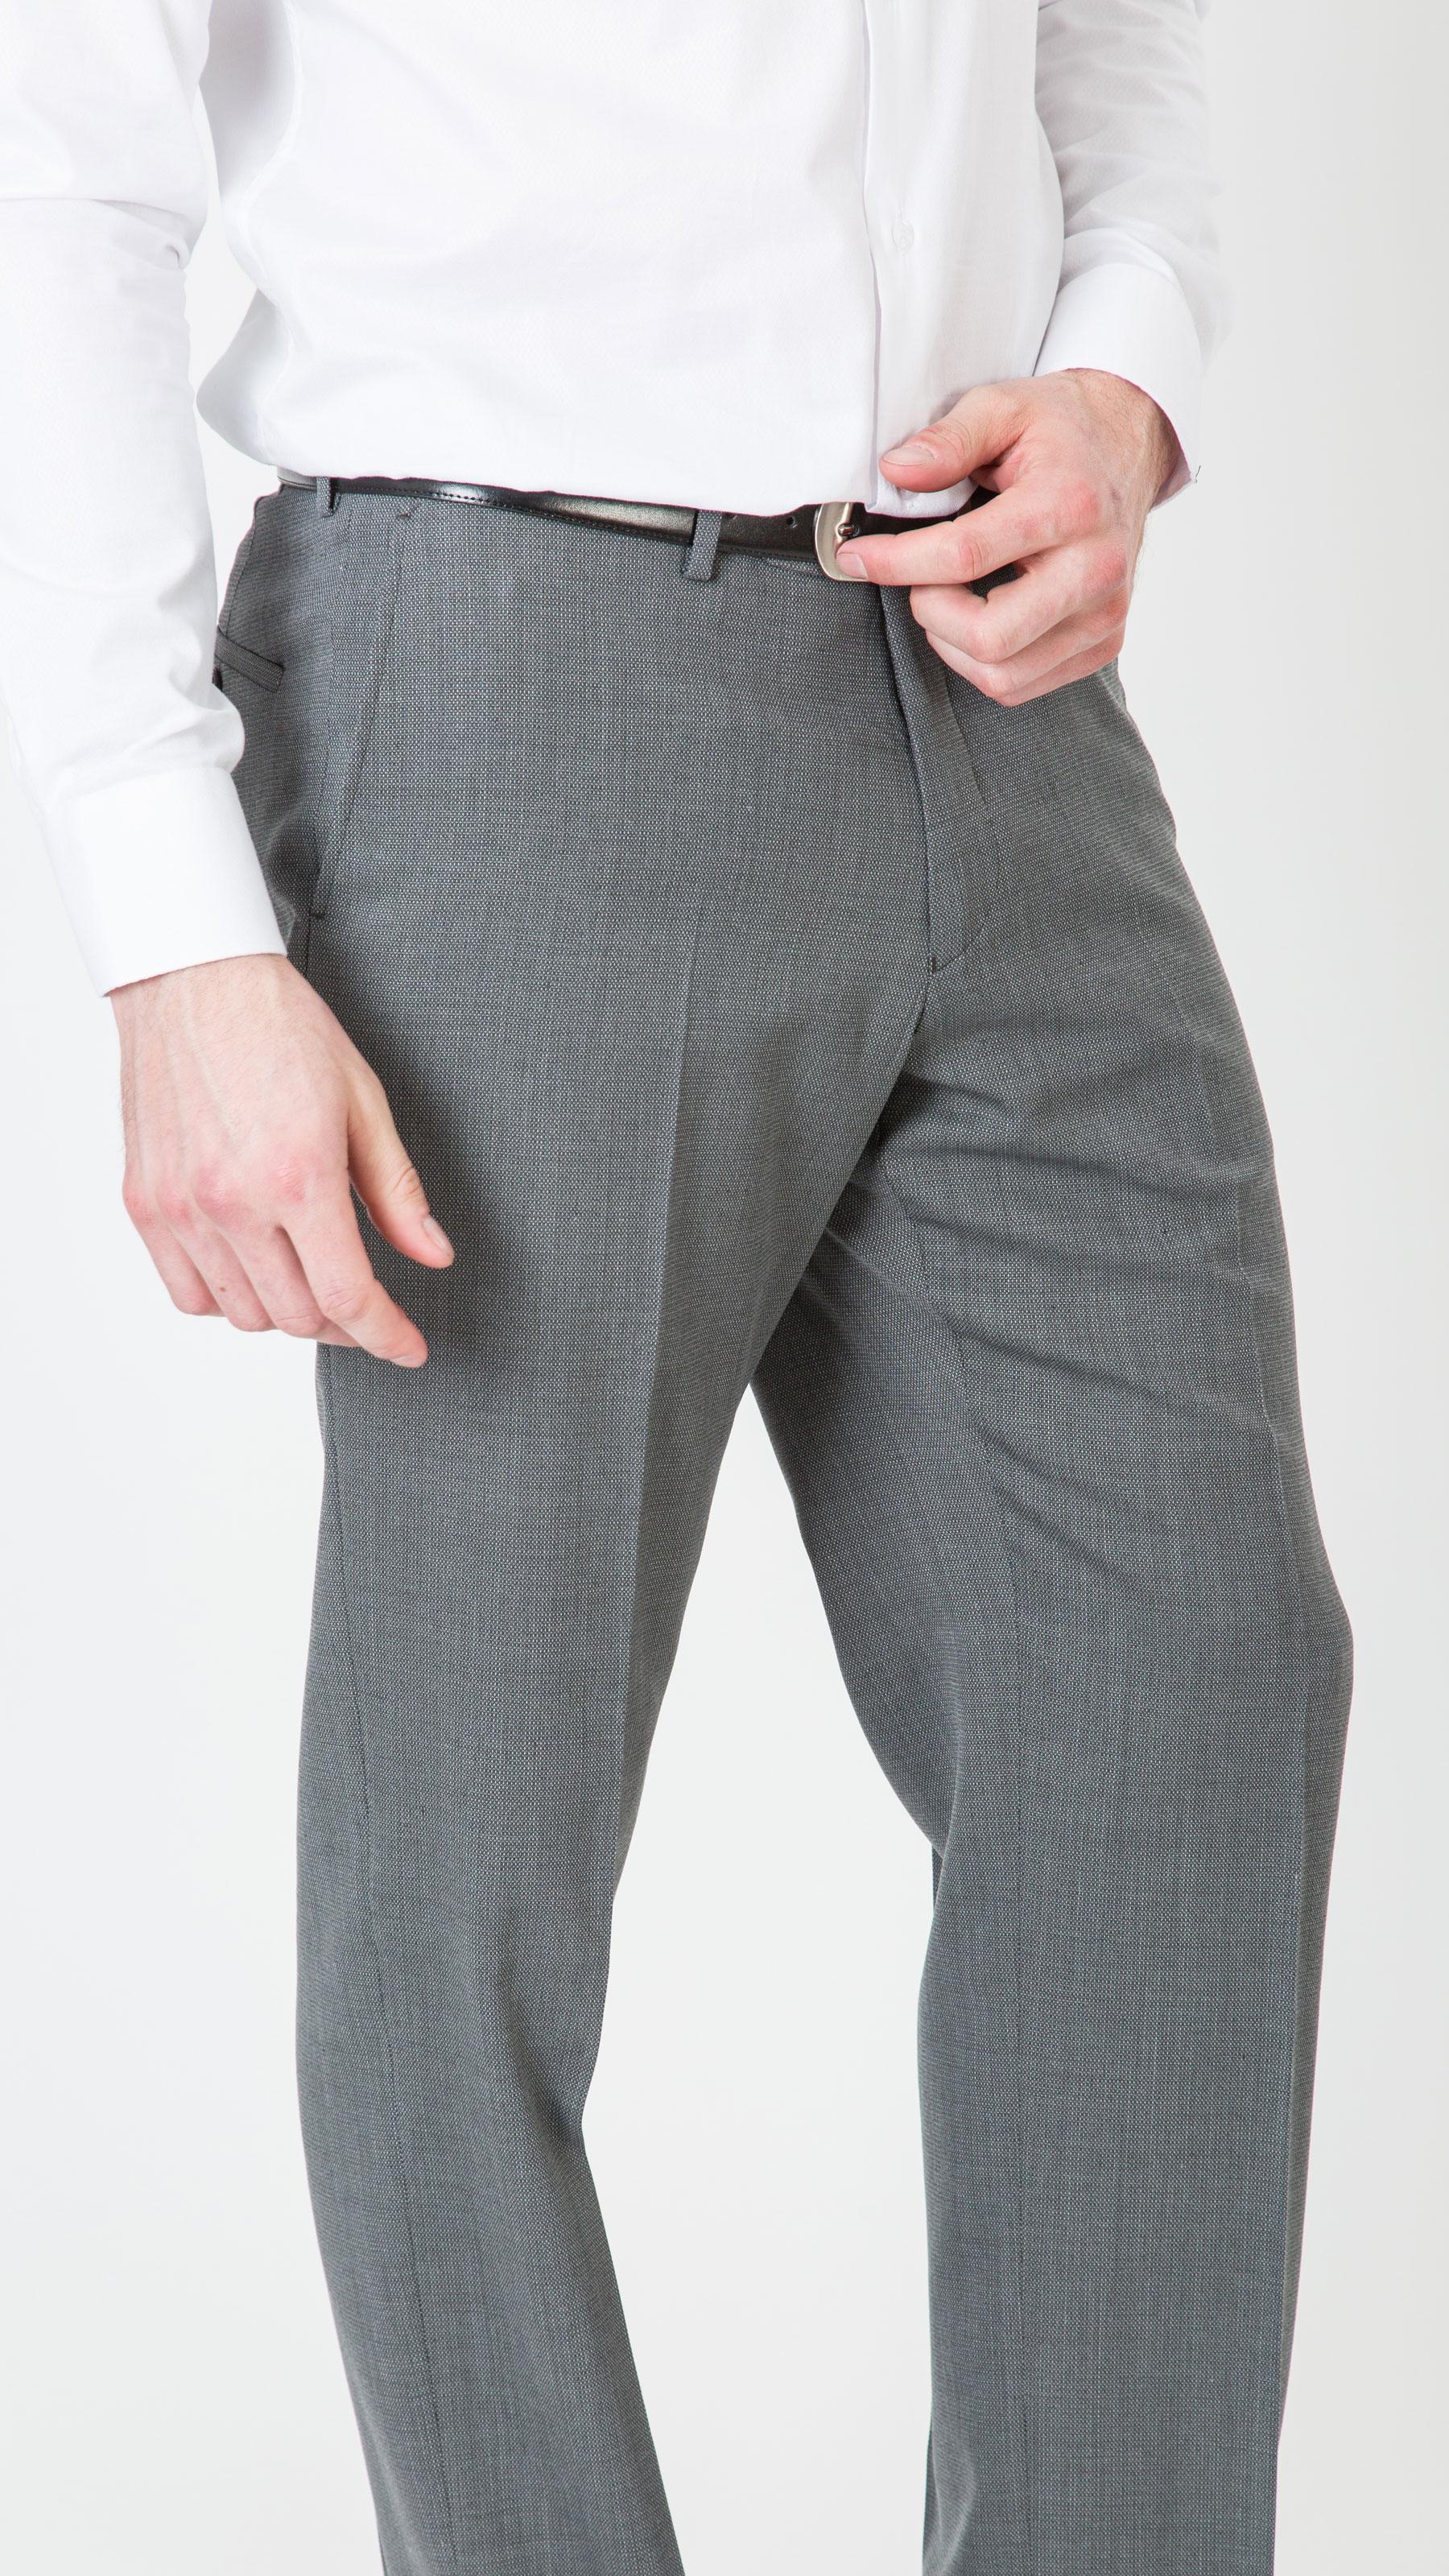 Pantalon ville gris bayard le voyageur